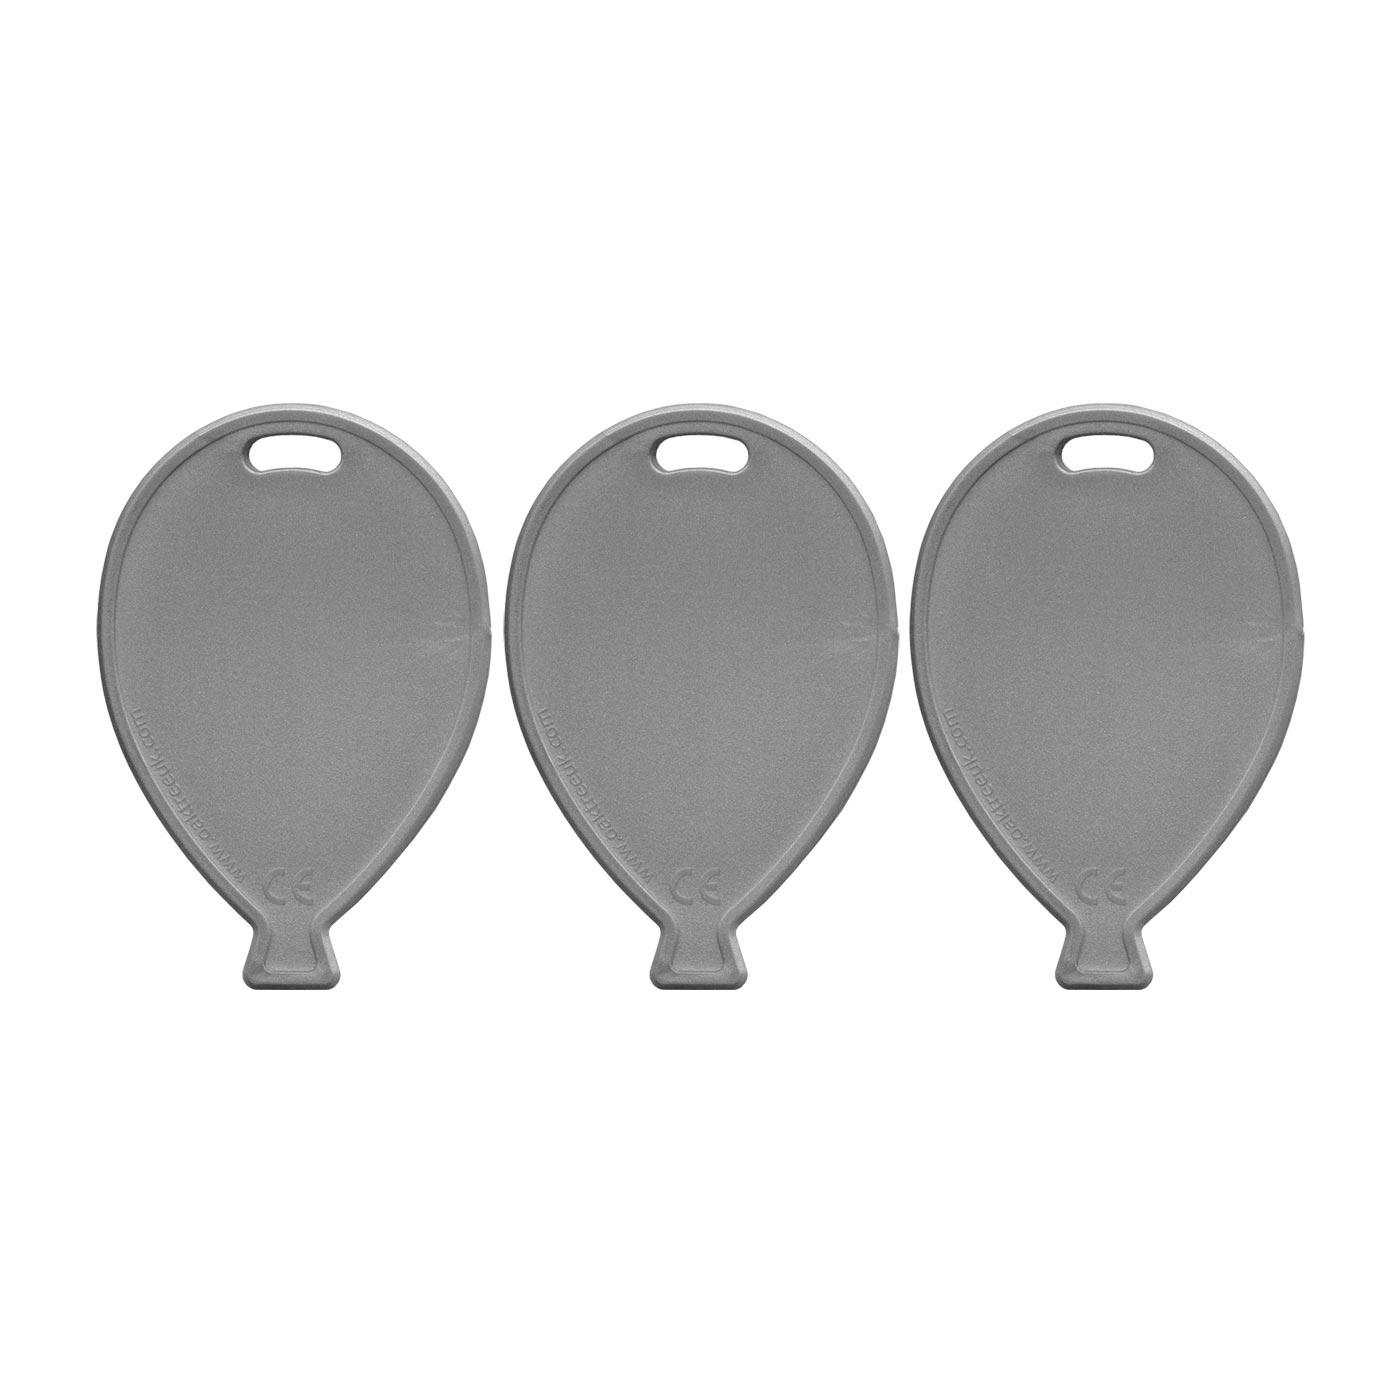 Silver Balloon Weights